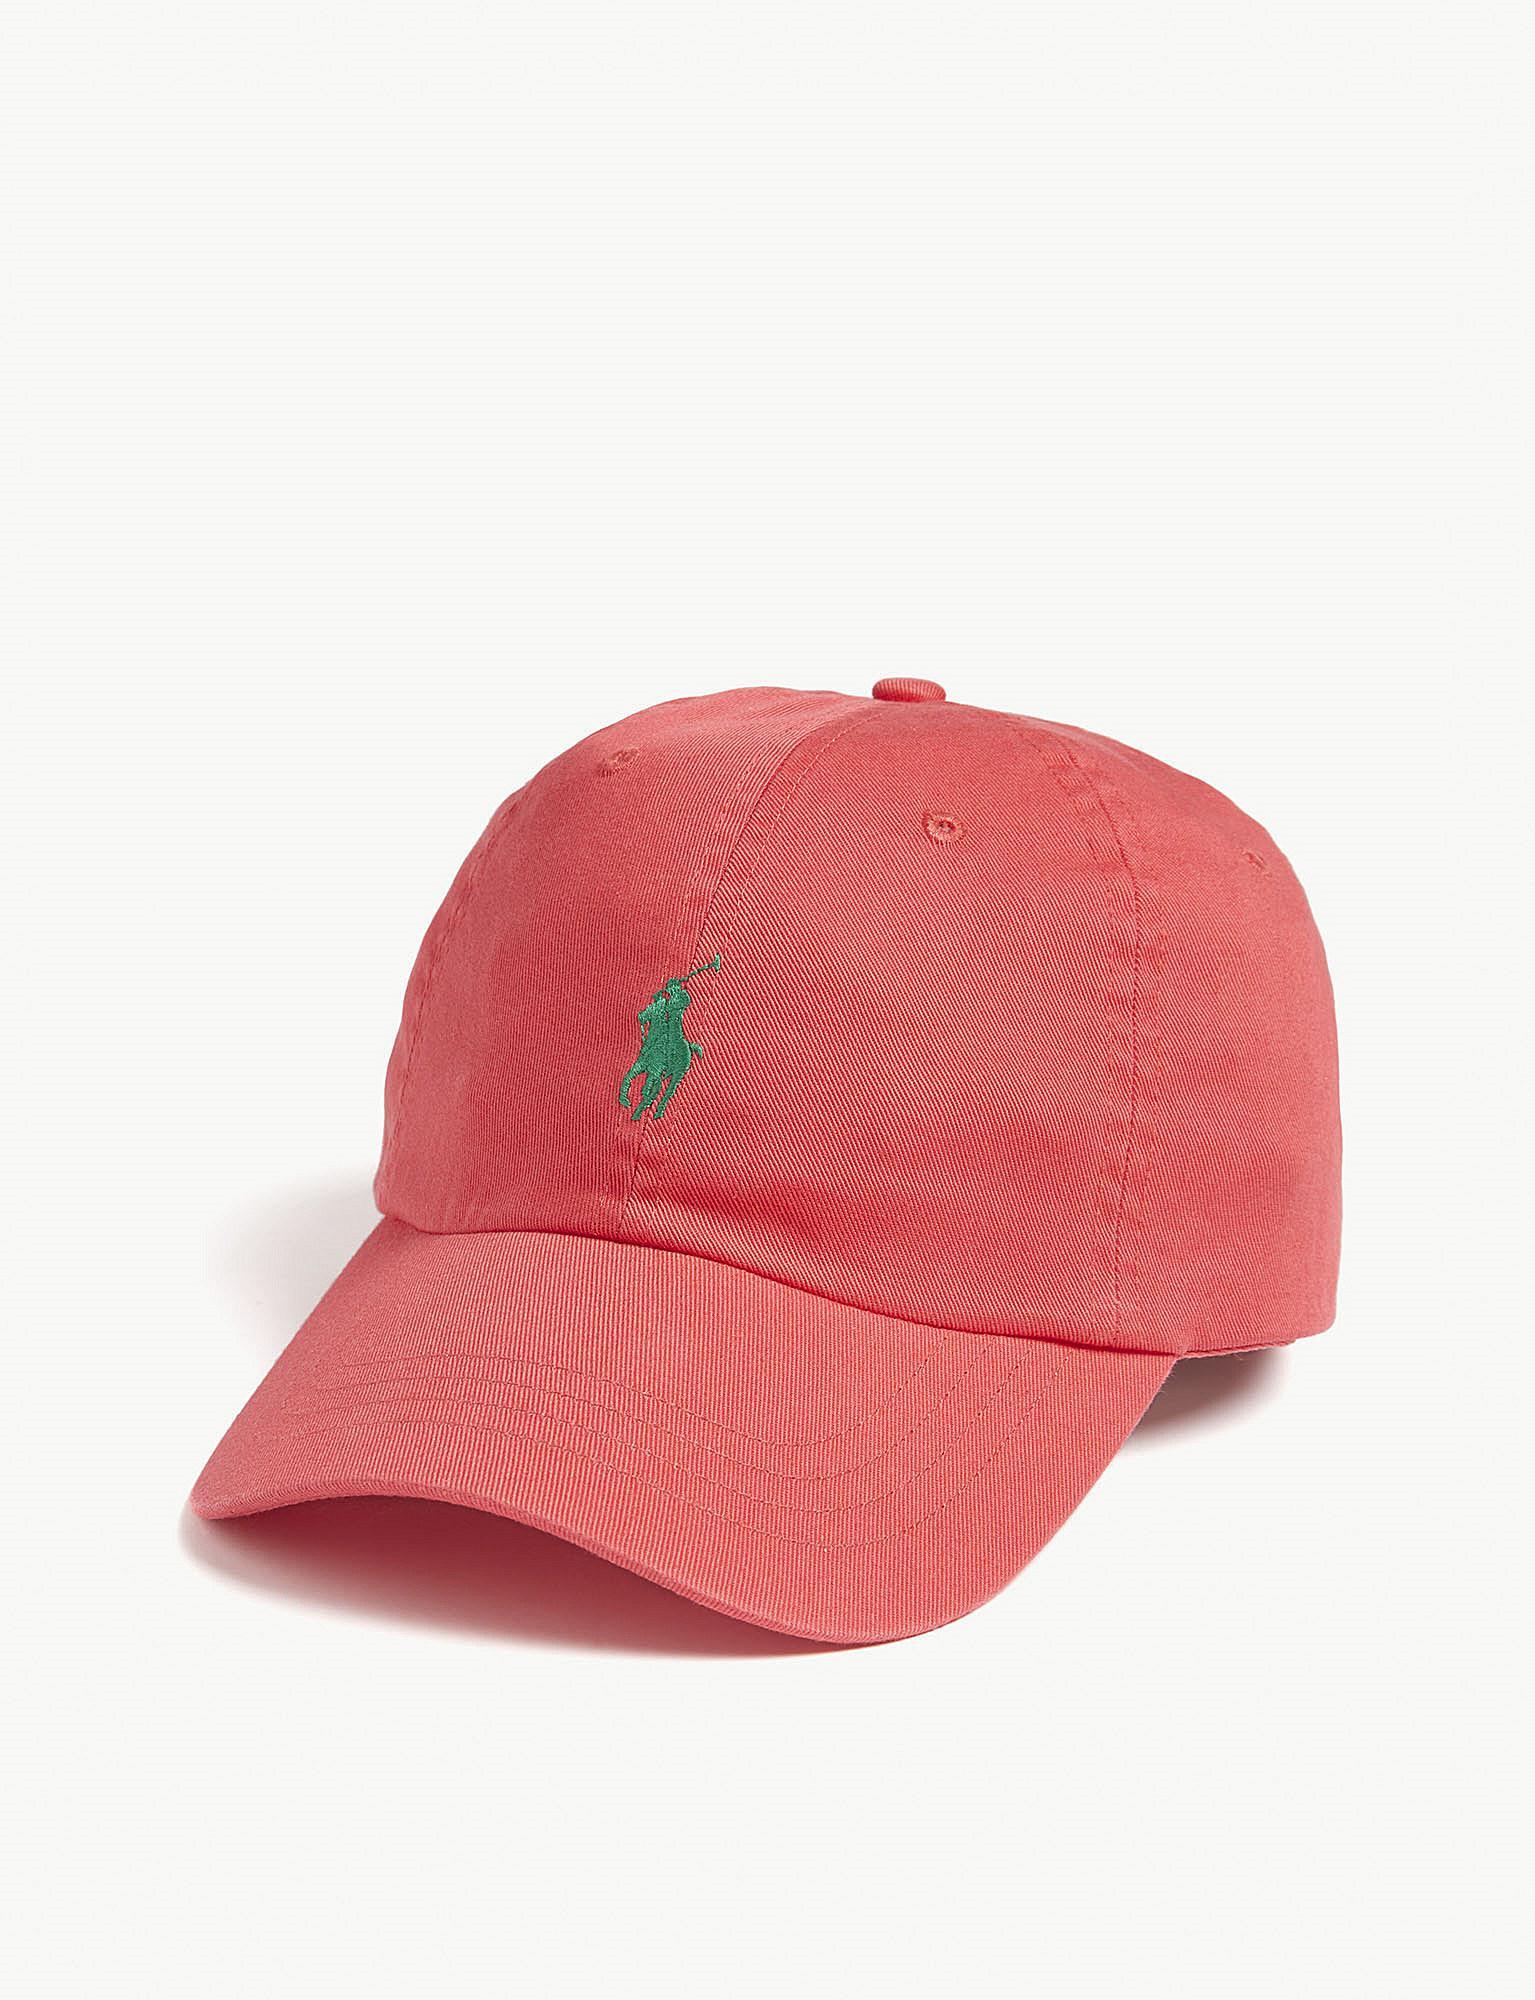 c720aaffaae534 Polo Ralph Lauren Pony Baseball Cap in Red for Men - Lyst